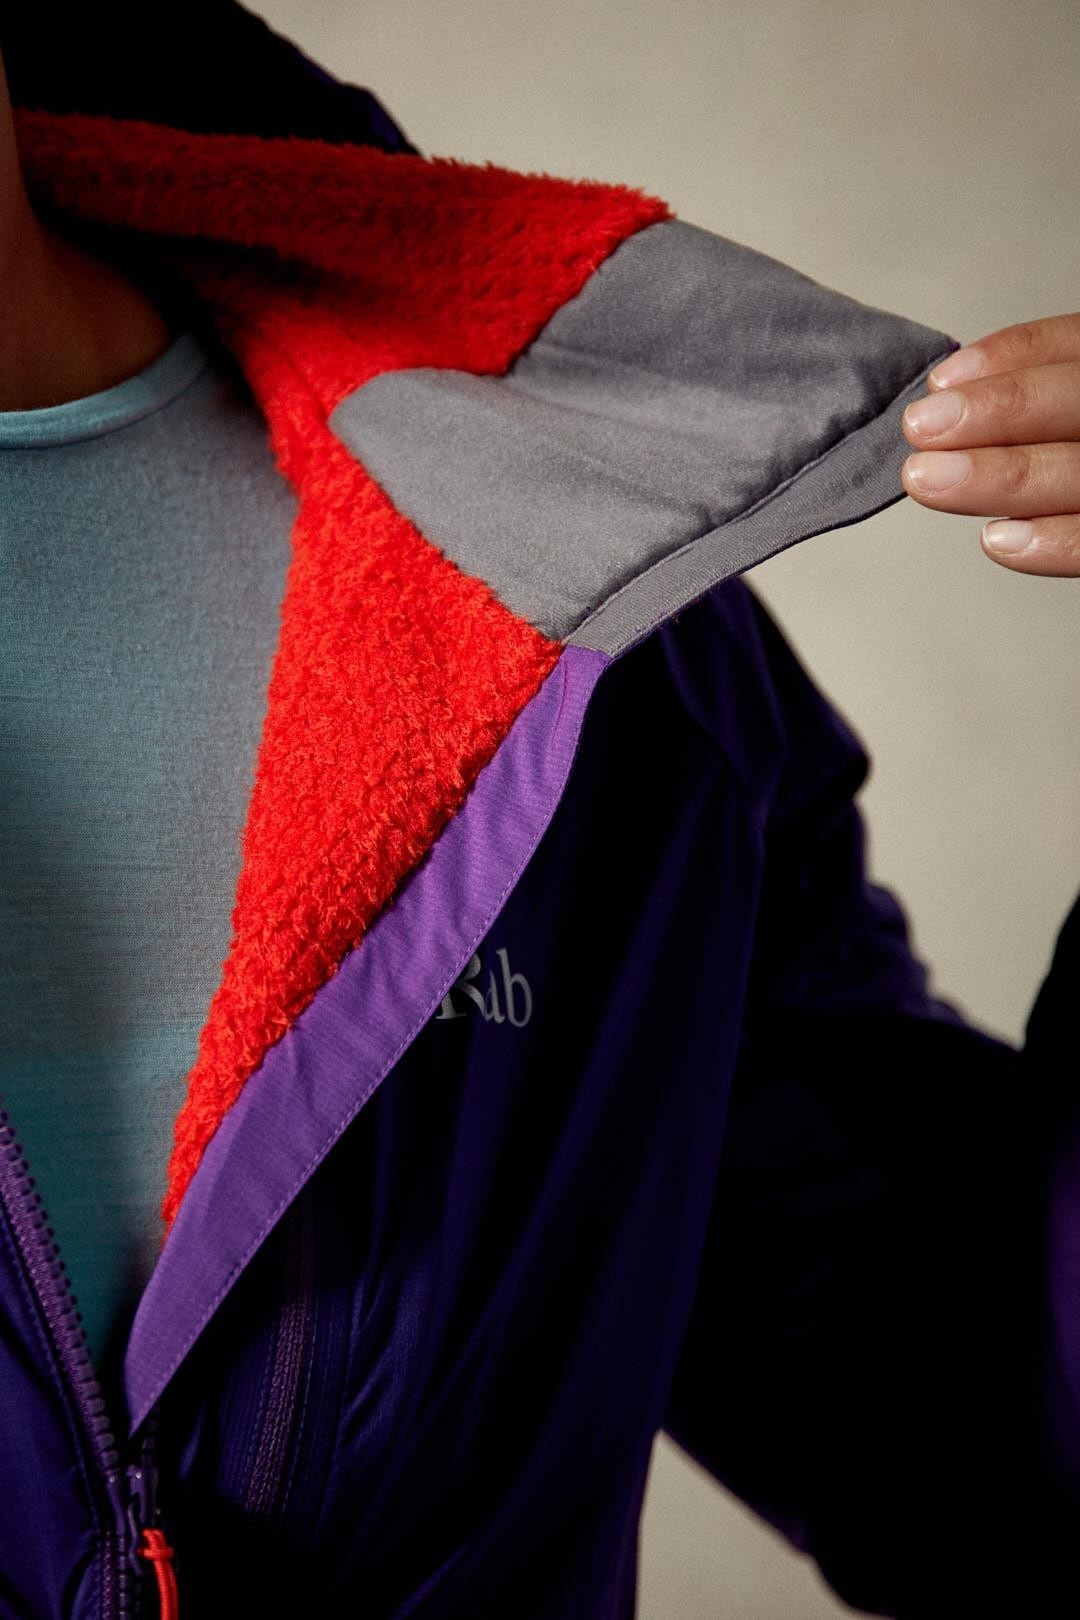 Rab Women's Alpha Direct Jacket - Nightshade/Juniper